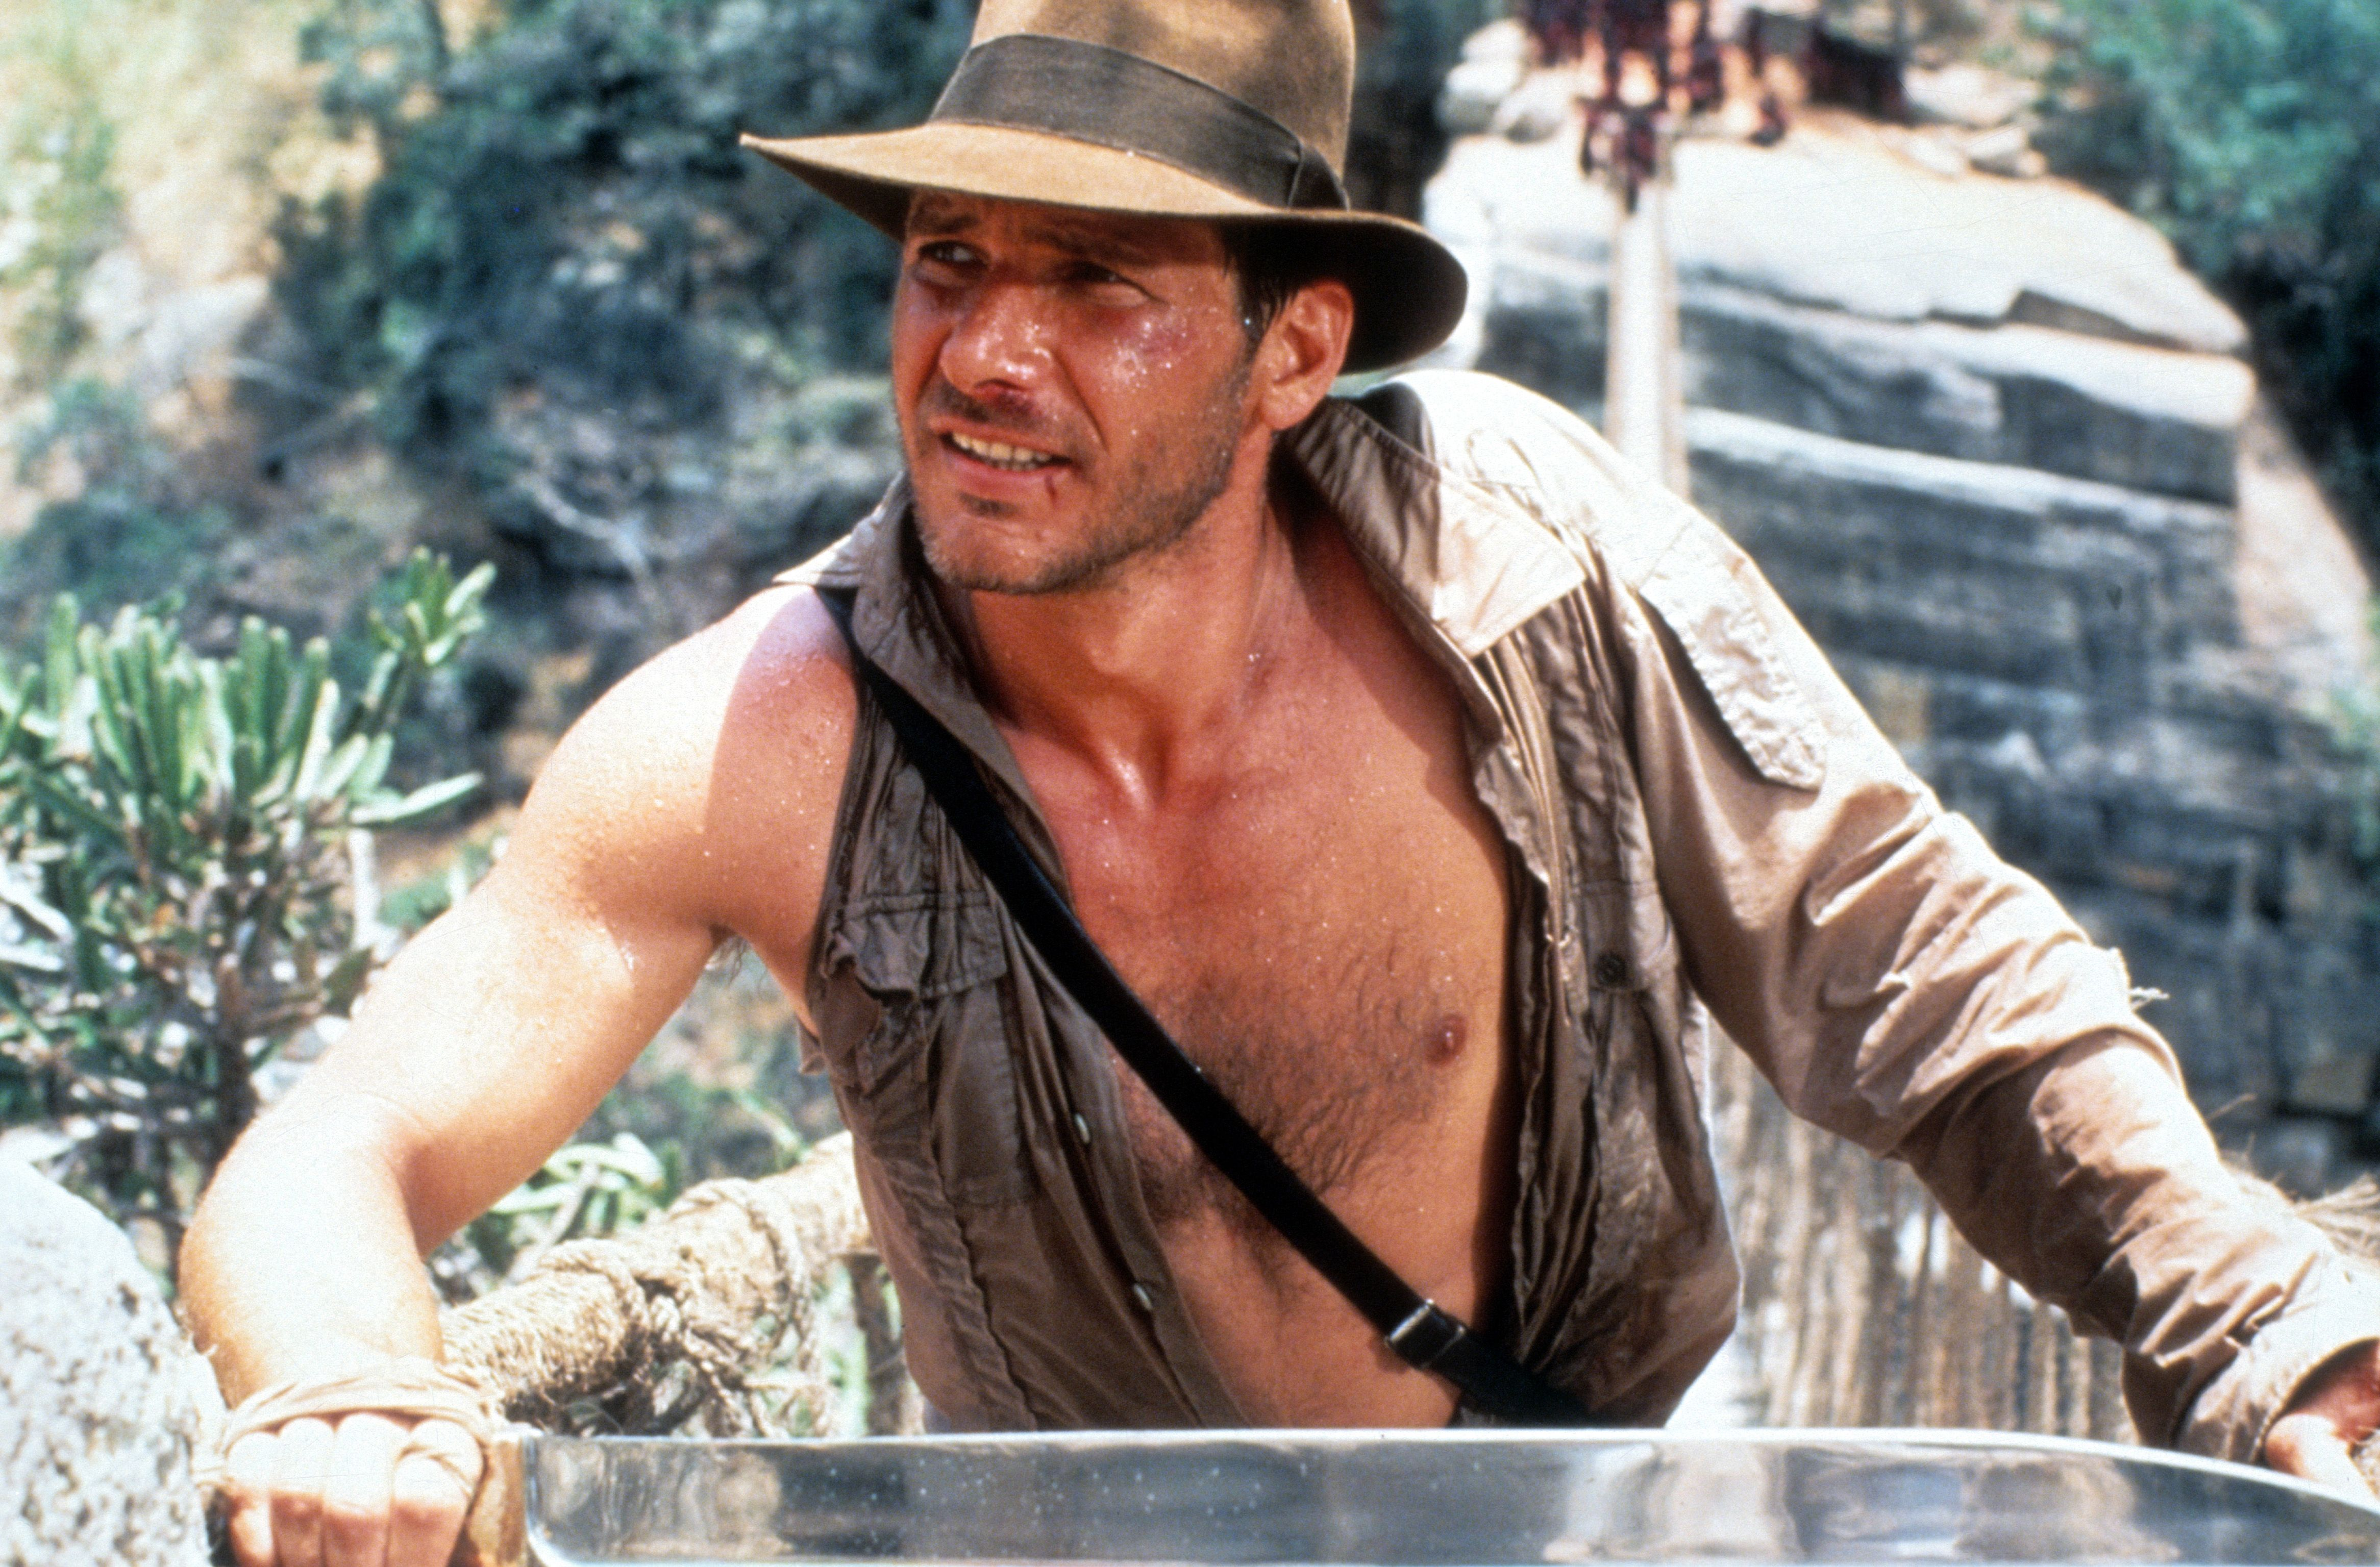 Harrison Ford Doesn't Want Chris Pratt to Play Indiana Jones